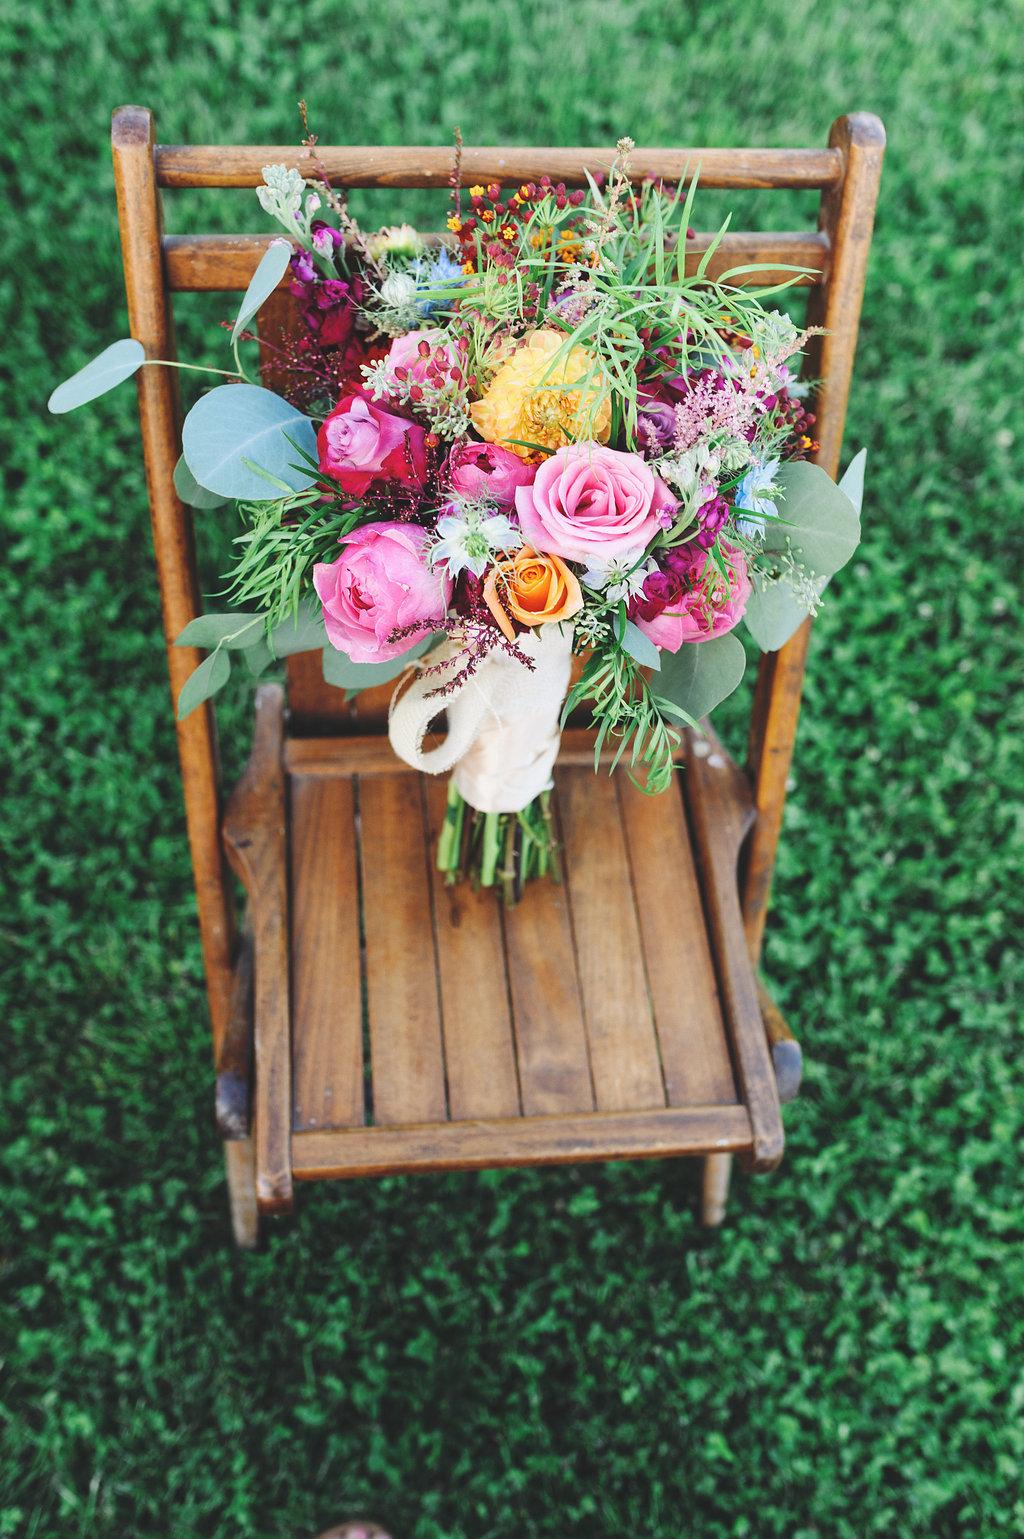 Bobo|Flowers_DSCN-50